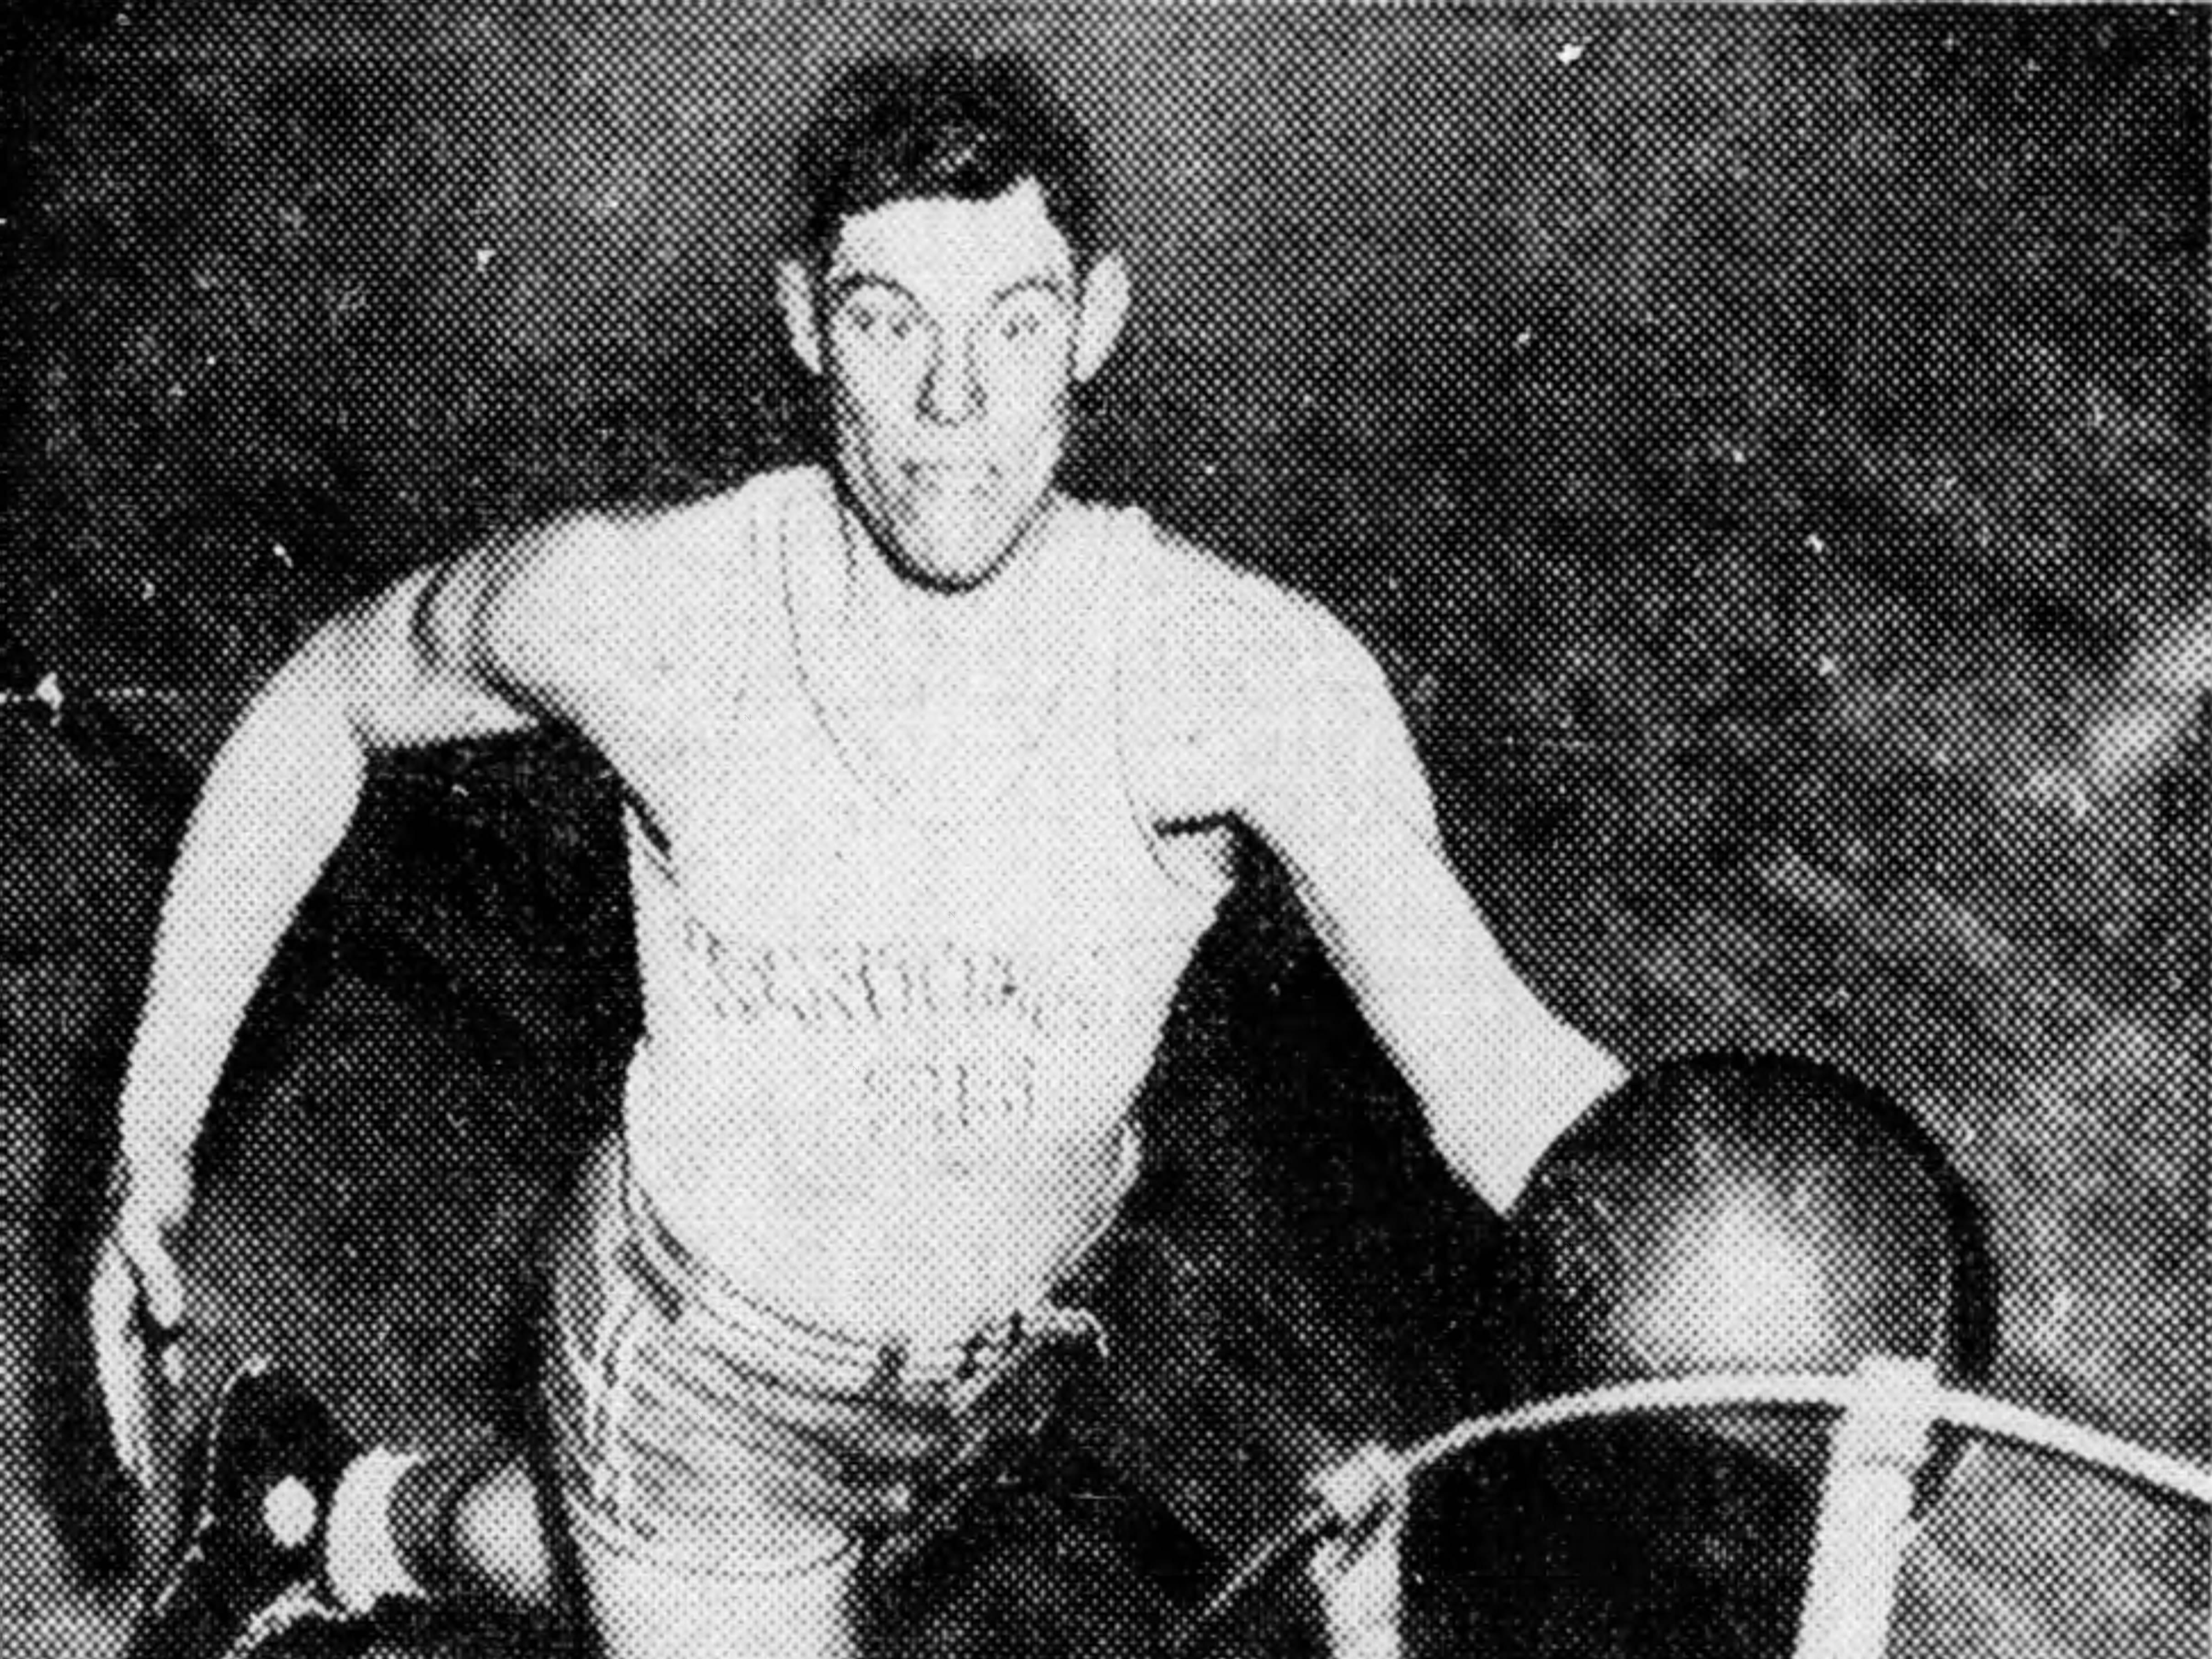 More than 70 years before John Calipari, UK had a one-and-done player